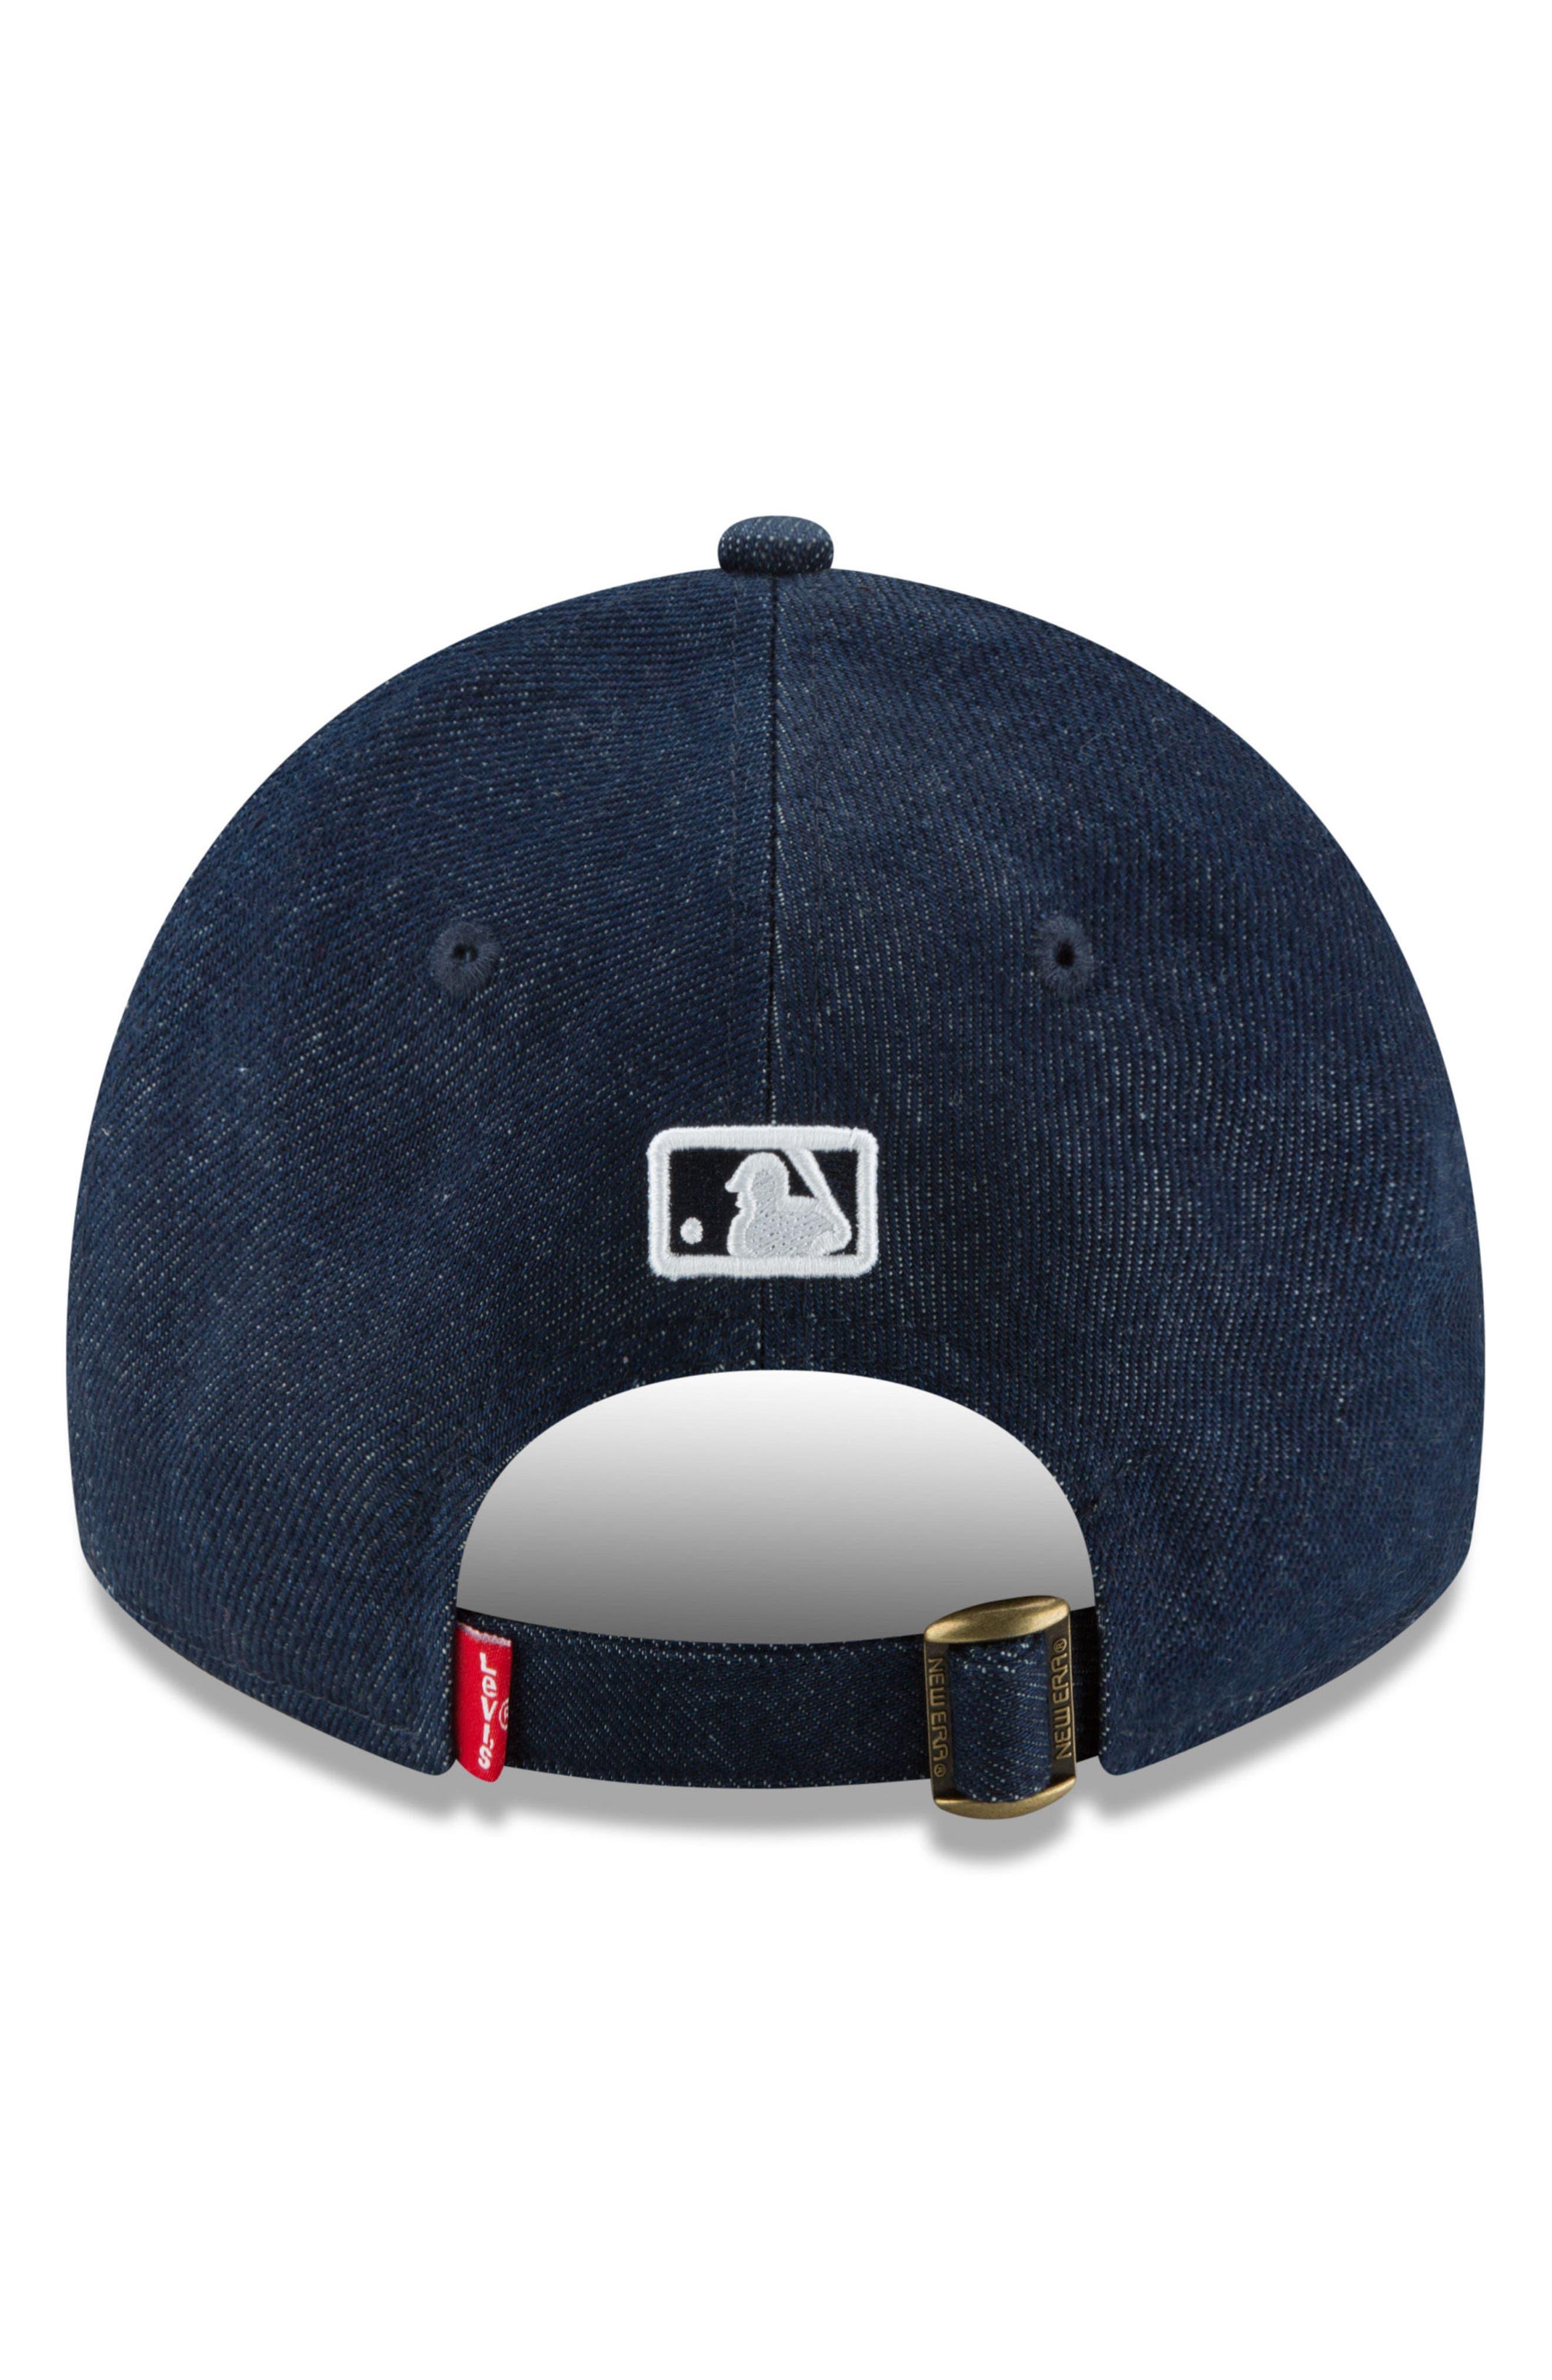 x Levi's<sup>®</sup> Dark Wash Baseball CAp,                             Alternate thumbnail 4, color,                             CHICAGO CUBS